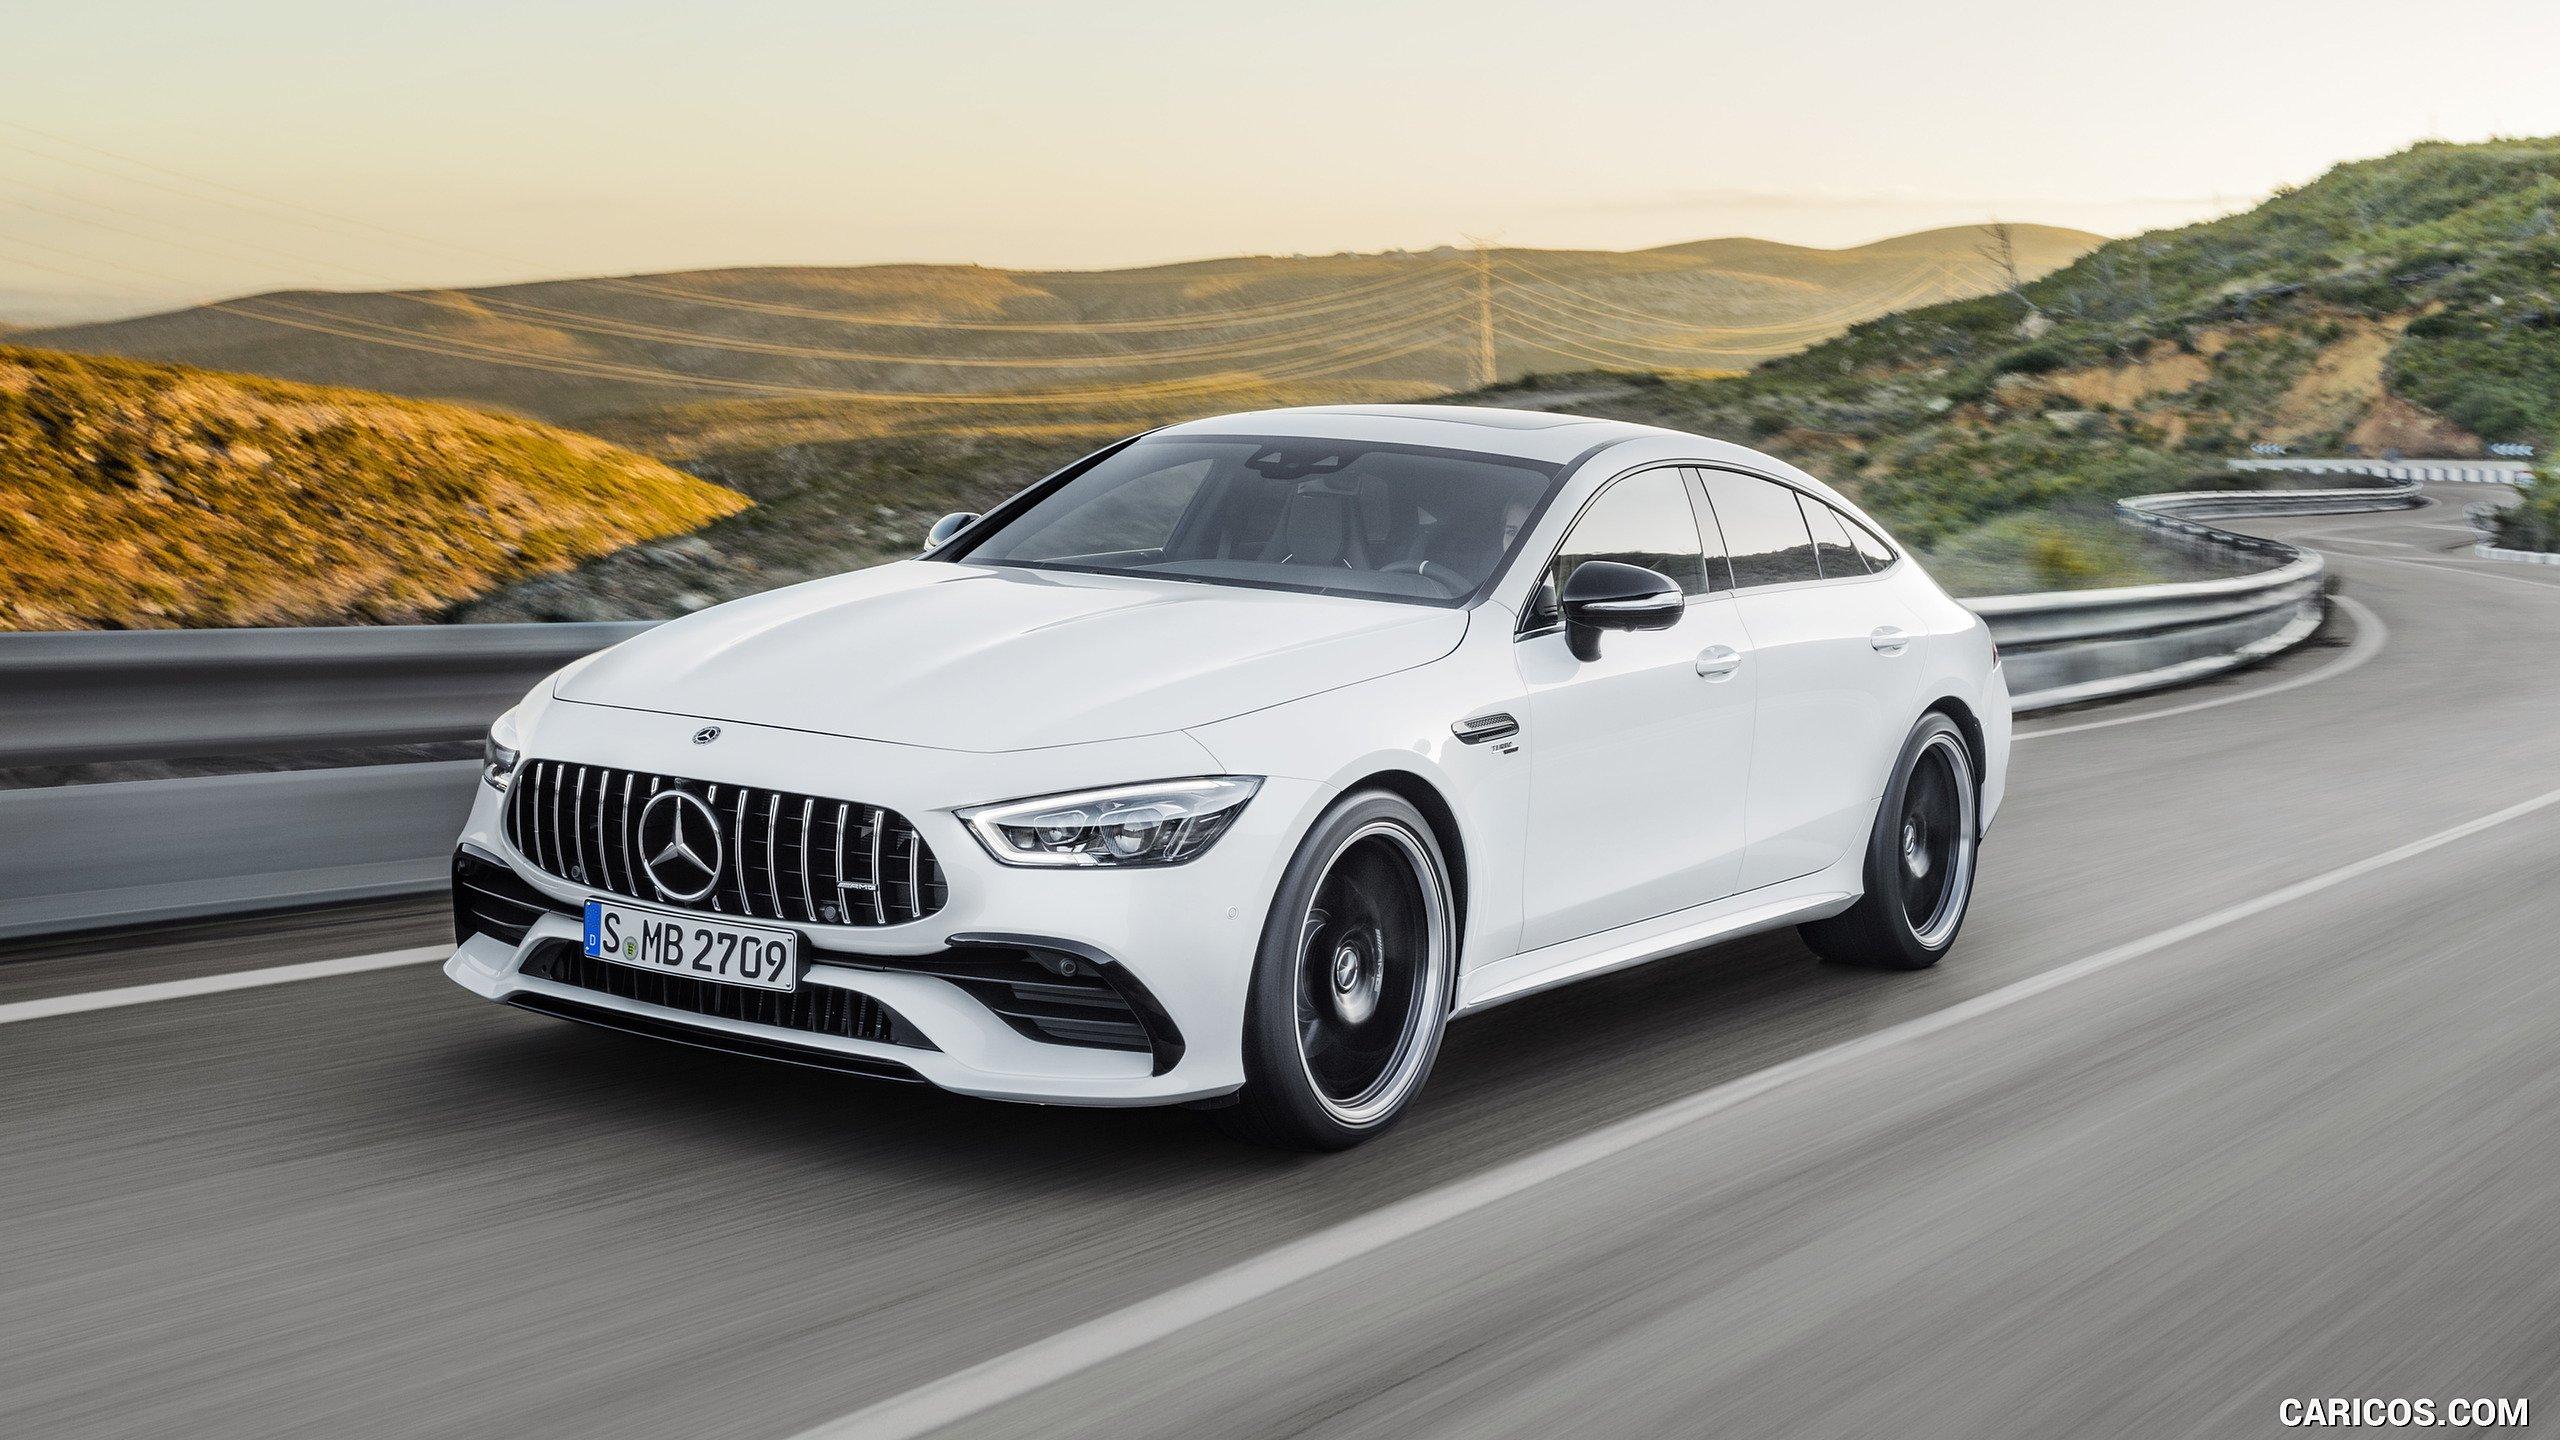 2019 Mercedes AMG GT 53 4MATIC 4 Door Coupe Color Designo 2560x1440